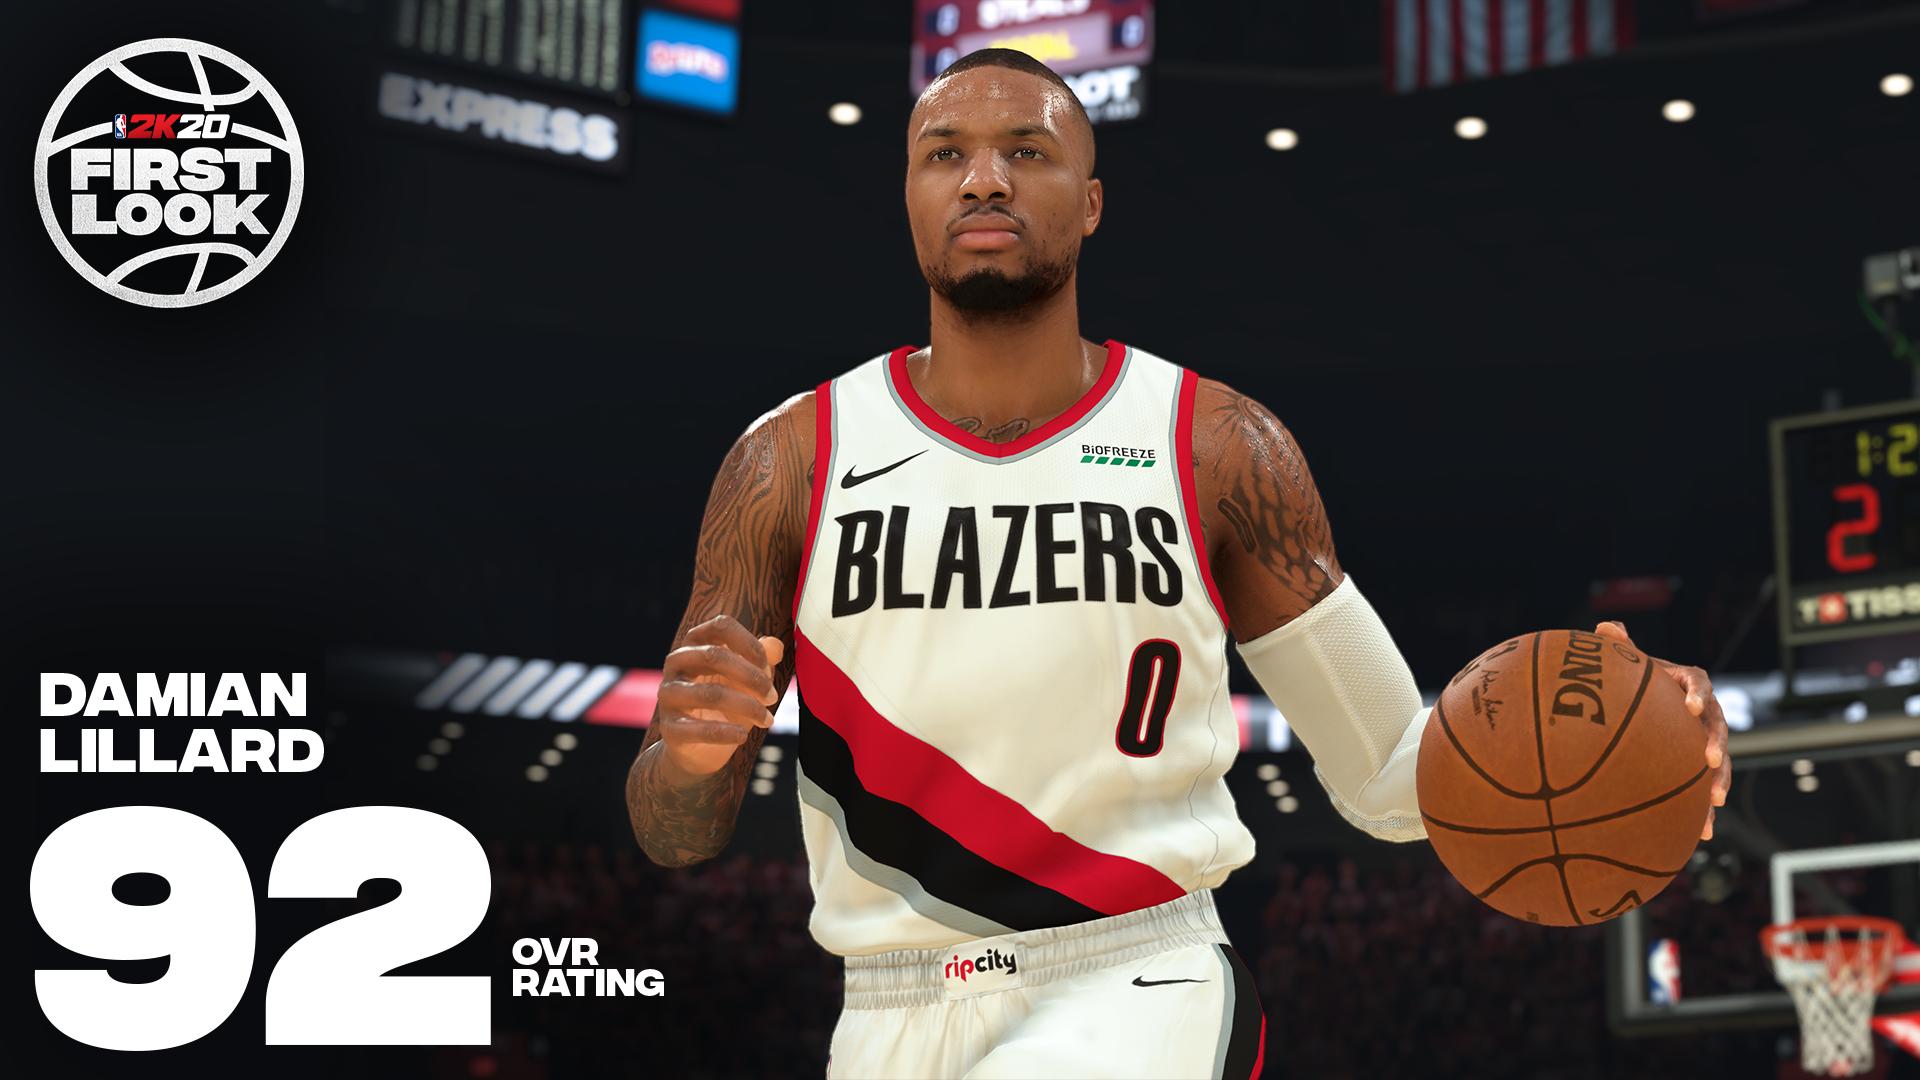 《NBA 2K20》明星球员评分公布!老詹连续10年评分最高 第12张